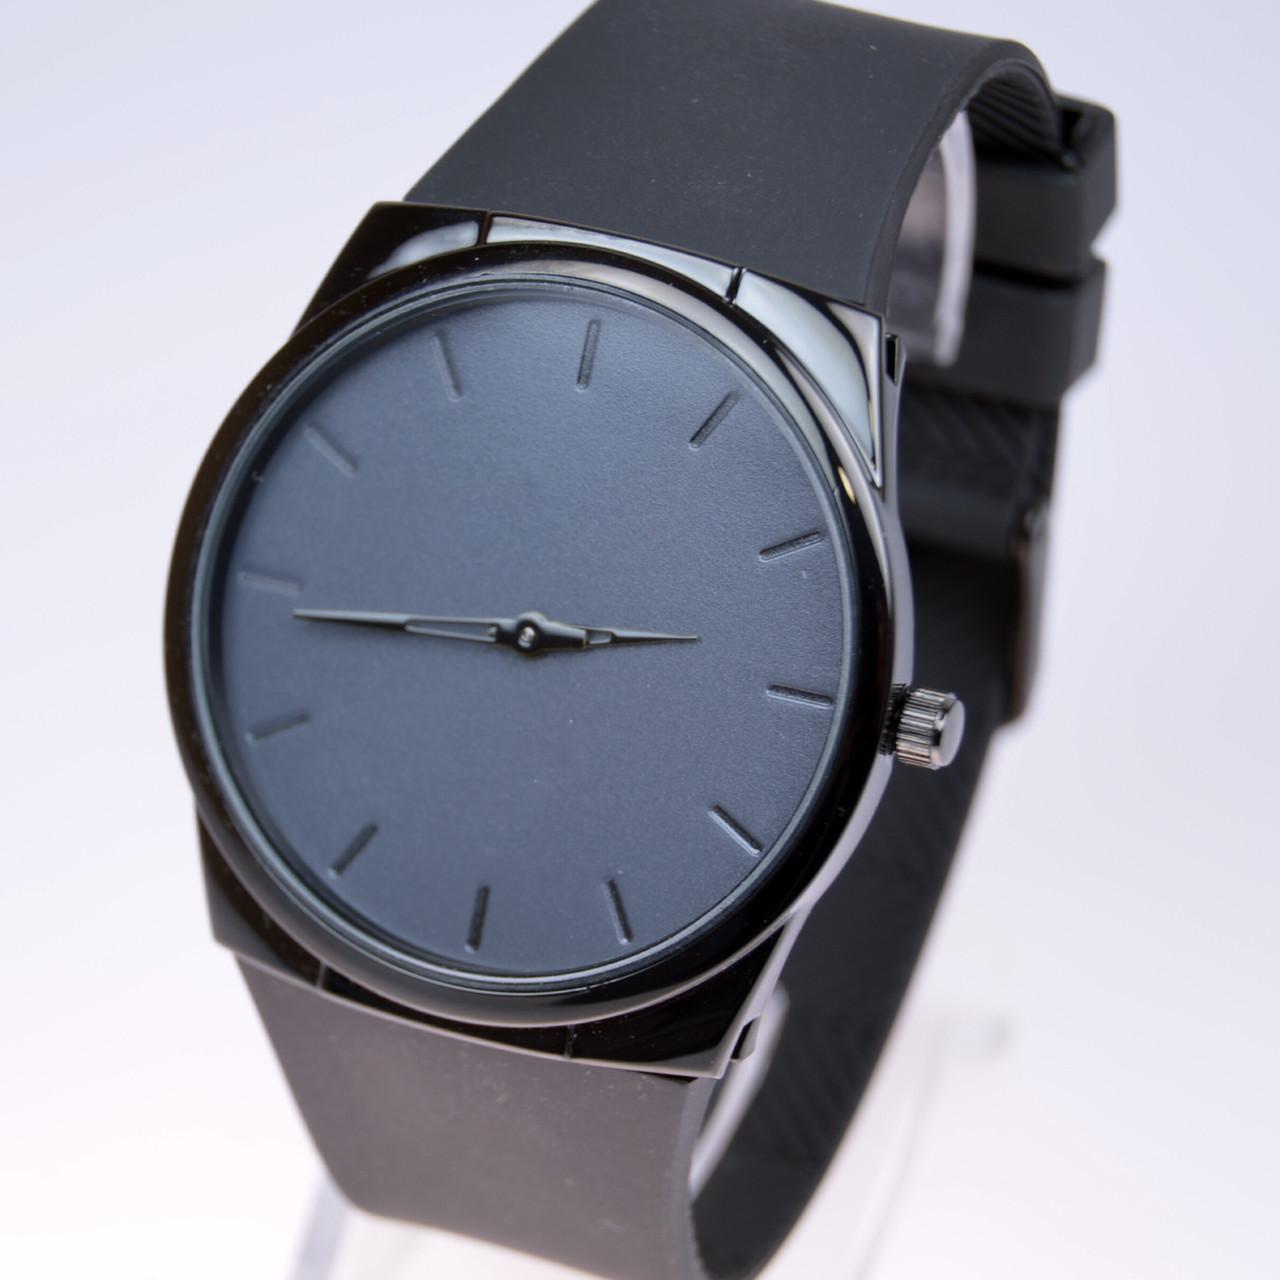 d9472301b508 Наручные часы Garuda 4923 кварц: продажа, цена в Николаеве. часы наручные и  карманные от ...